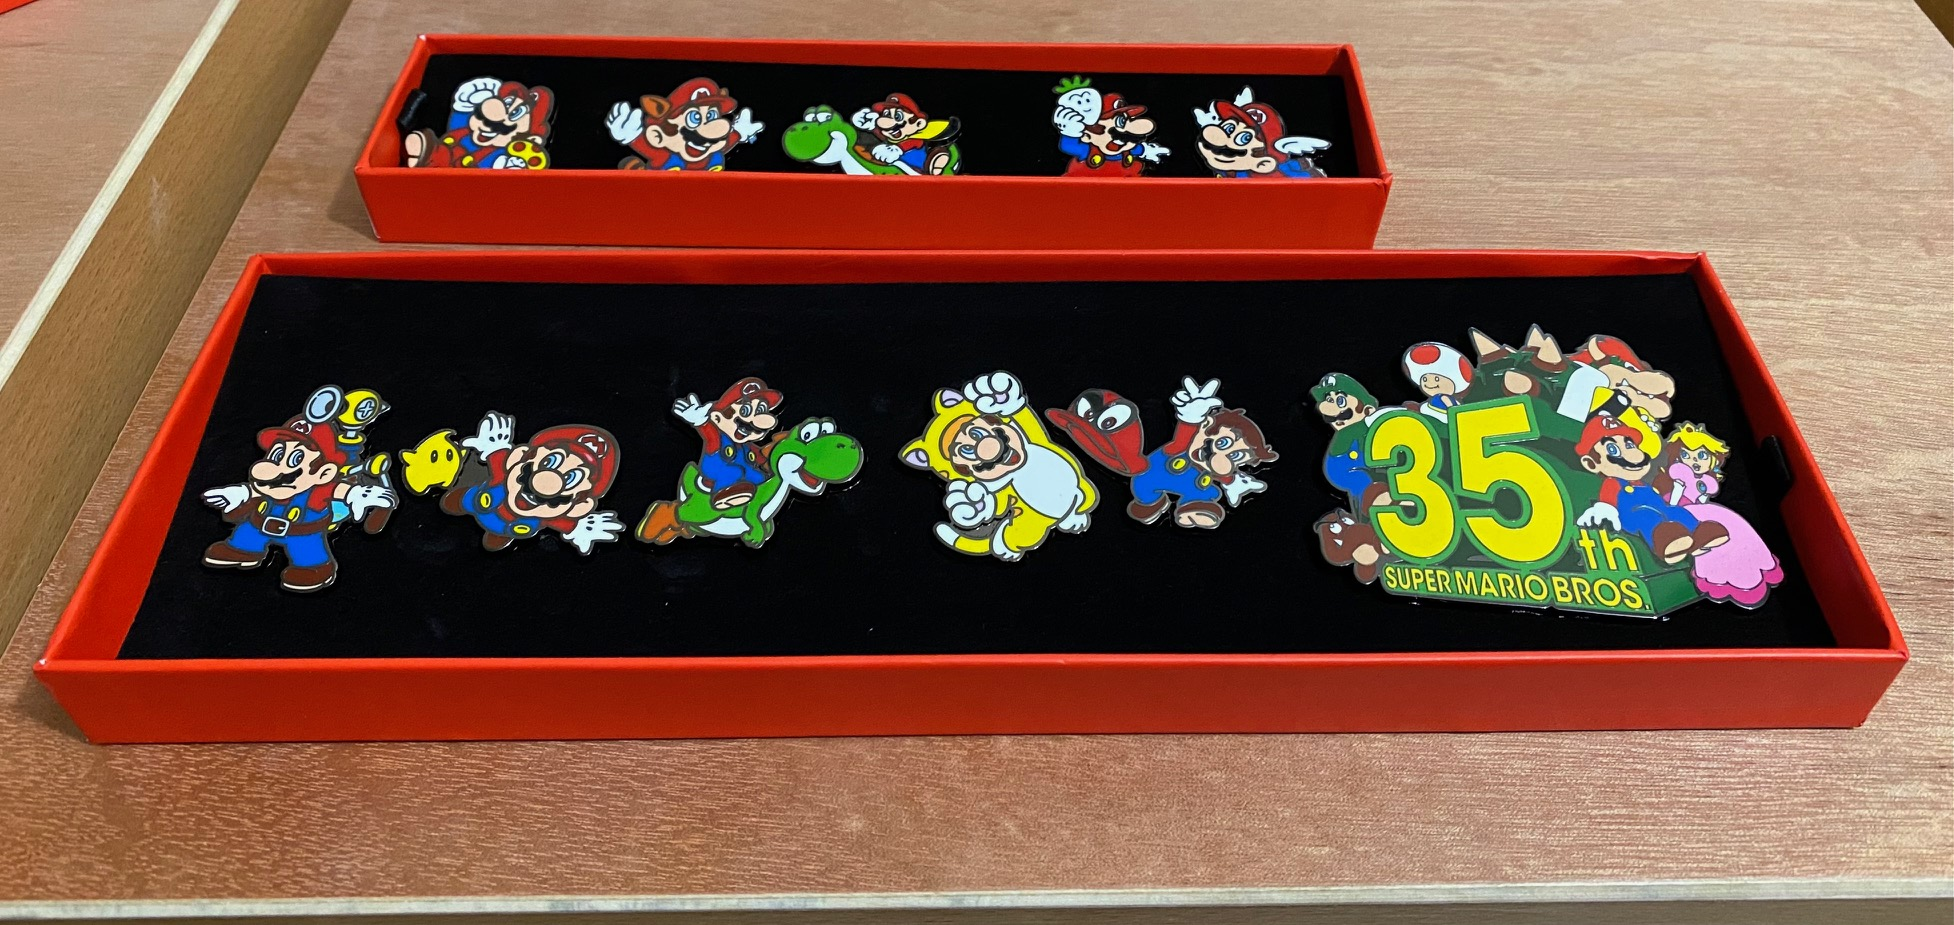 Whoa, the box for the new Mario 35th anniversary pin set is huge screenshot